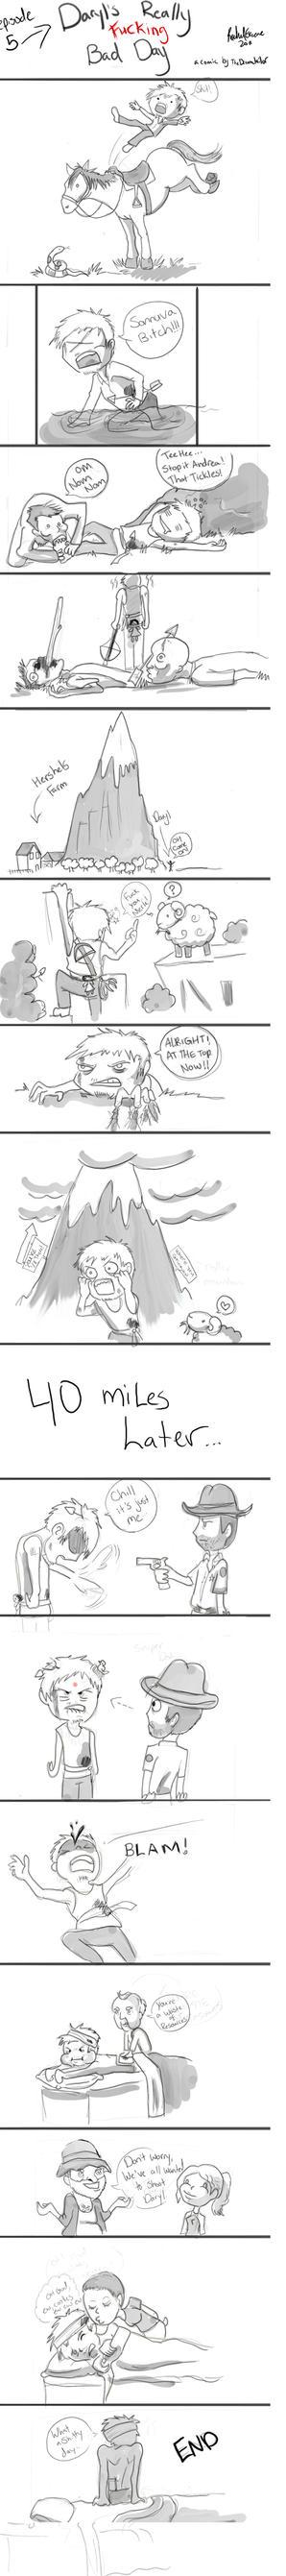 Daryl's shitty day by Akuya-Kyuubi